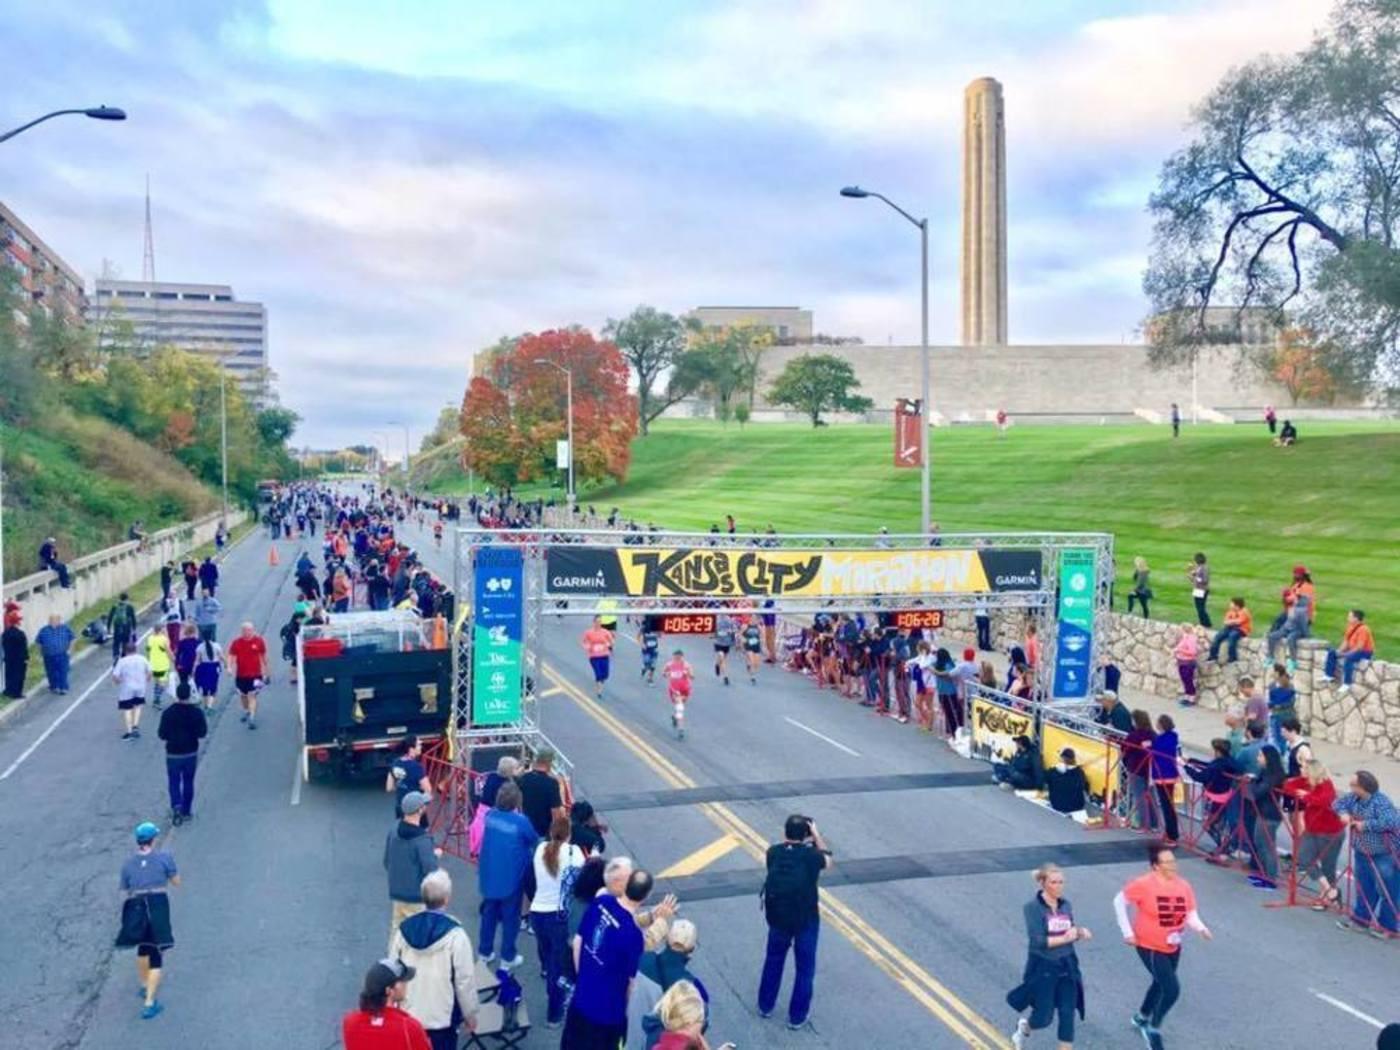 Kansas City Marathon presented by Garmin